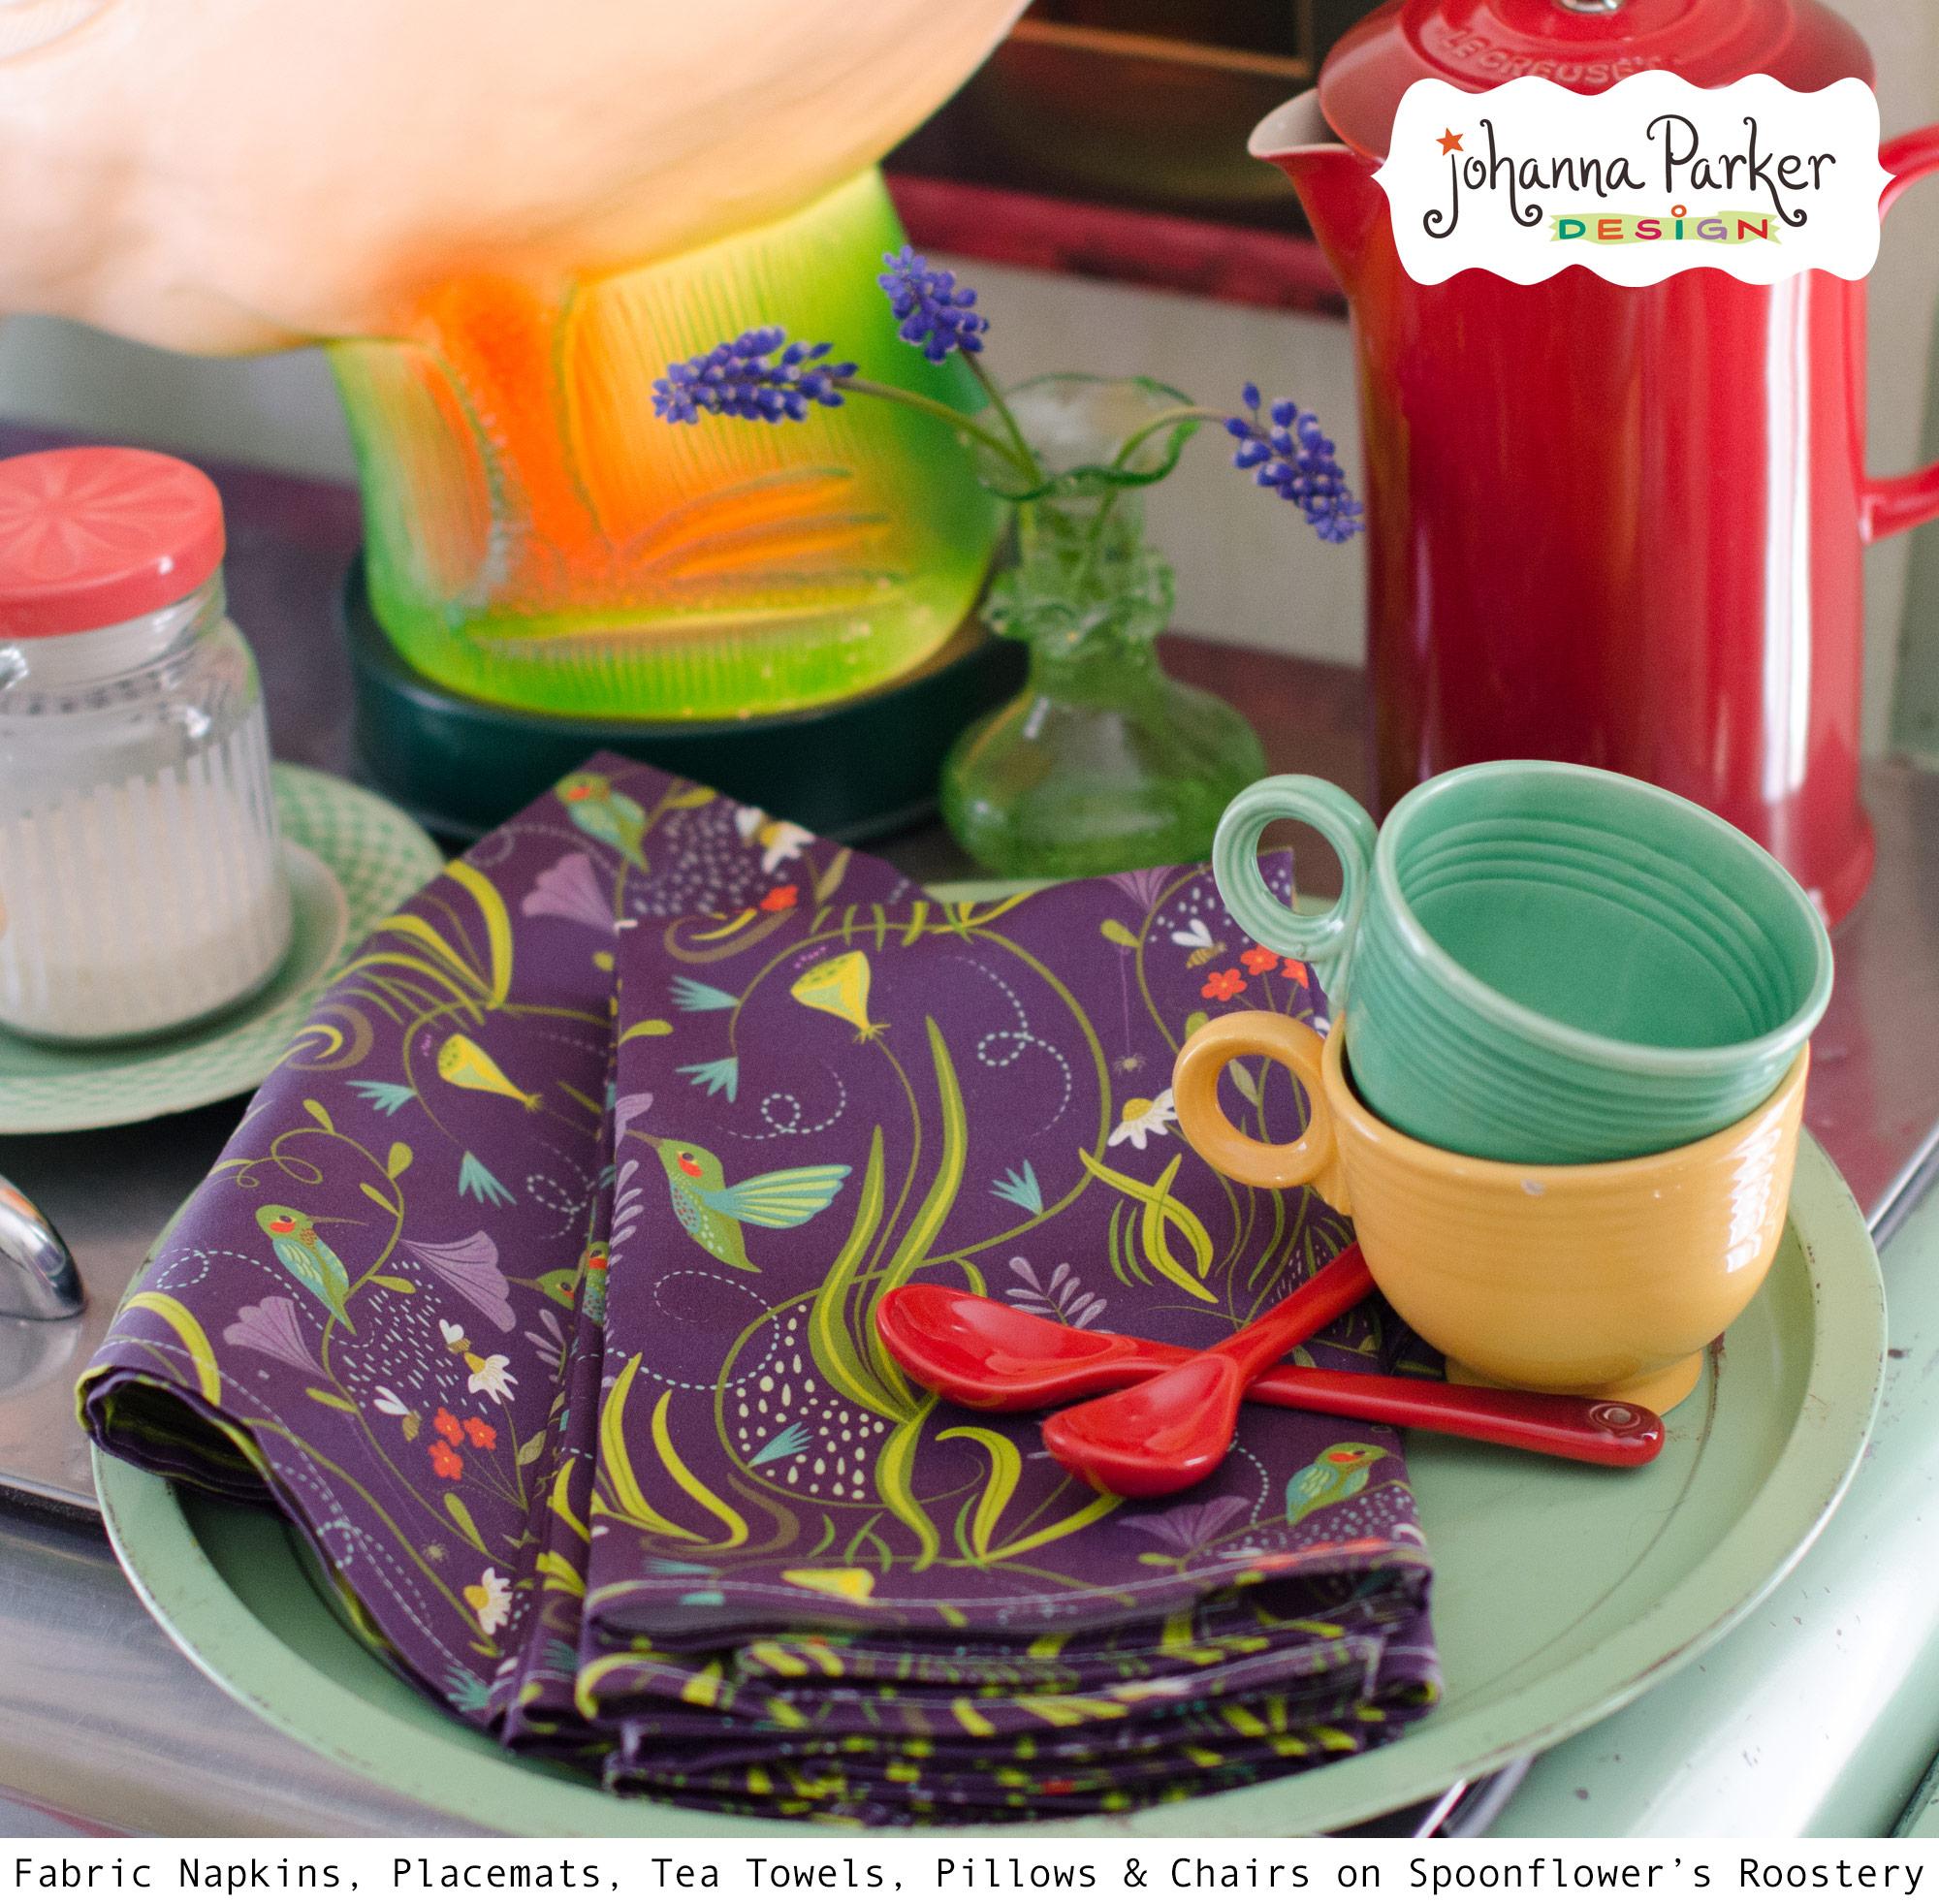 Johanna-Parker-Hummingbird-Fabric-Napkins.png